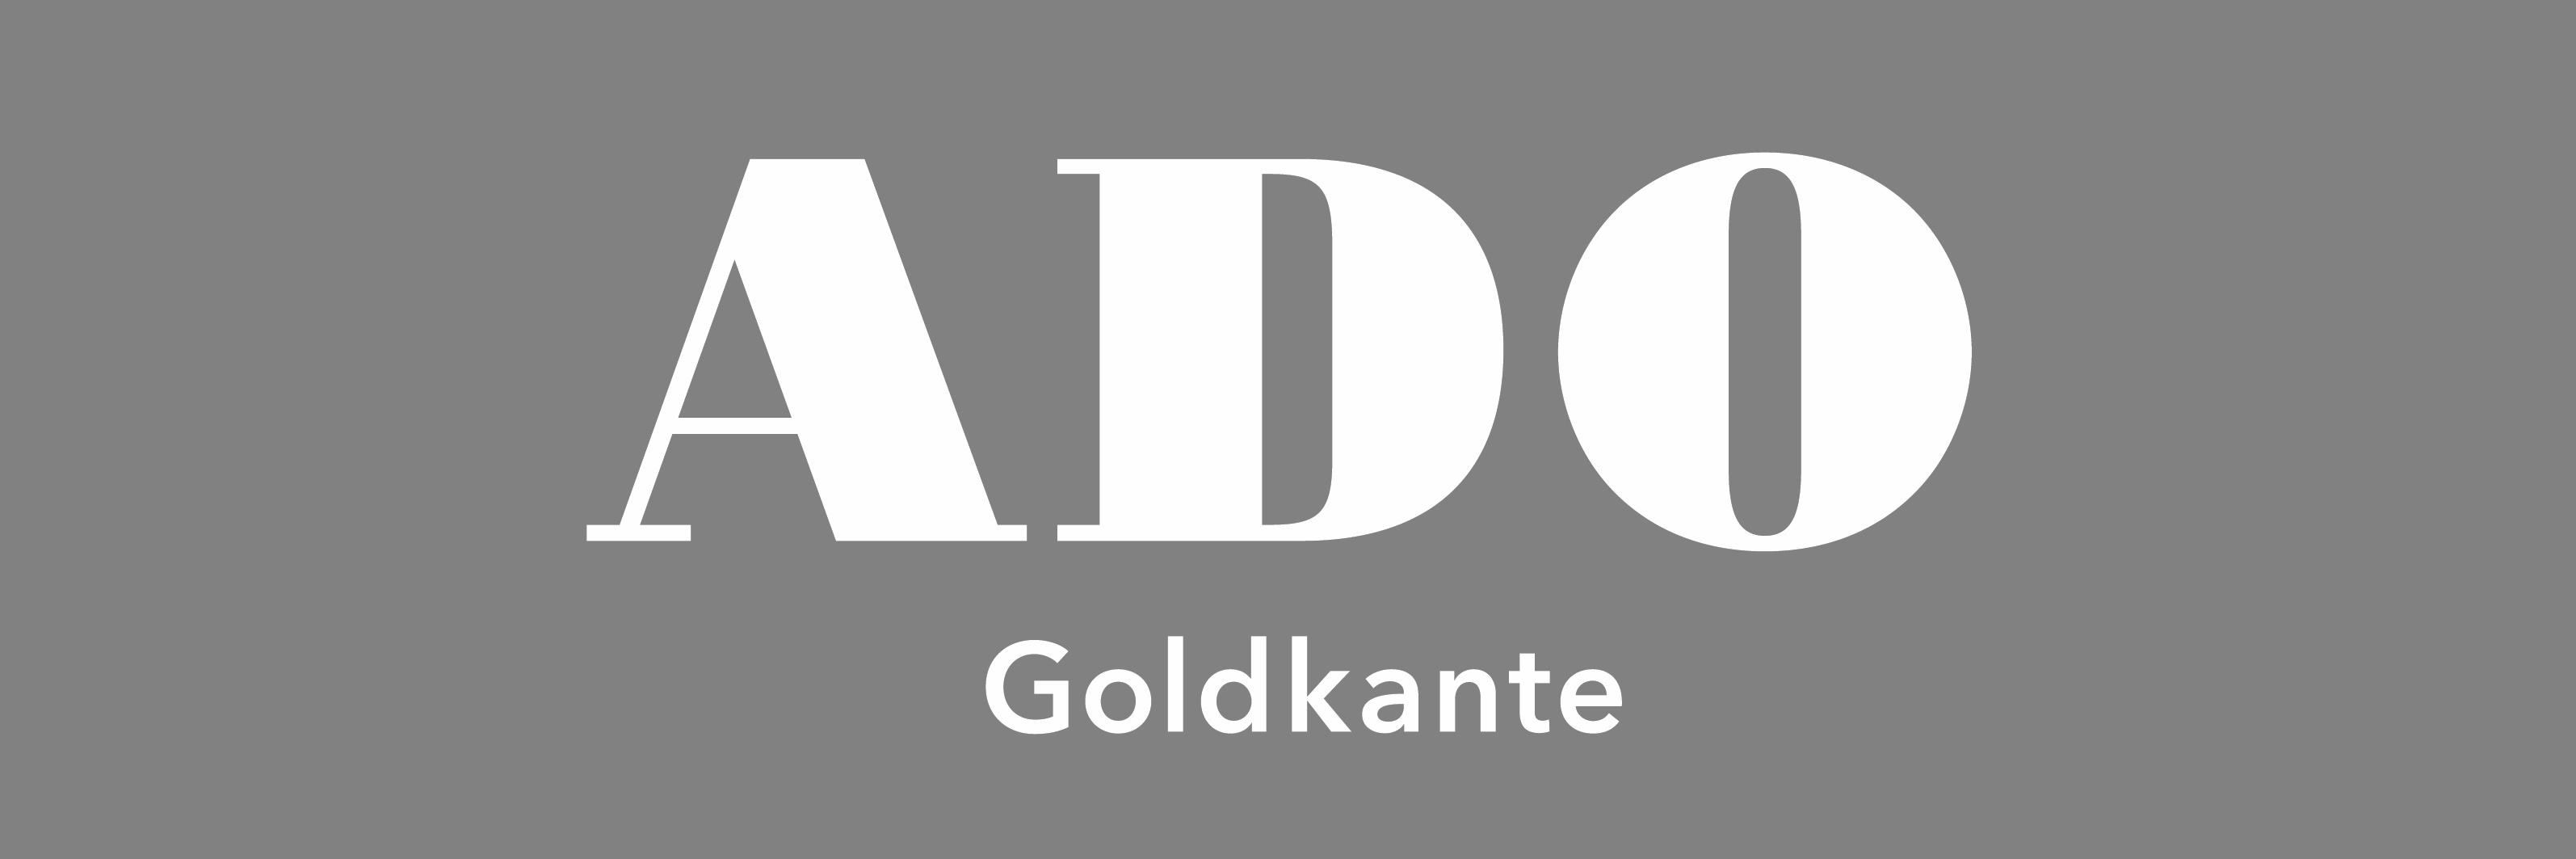 https://www.ado-goldkante.de/de-de/